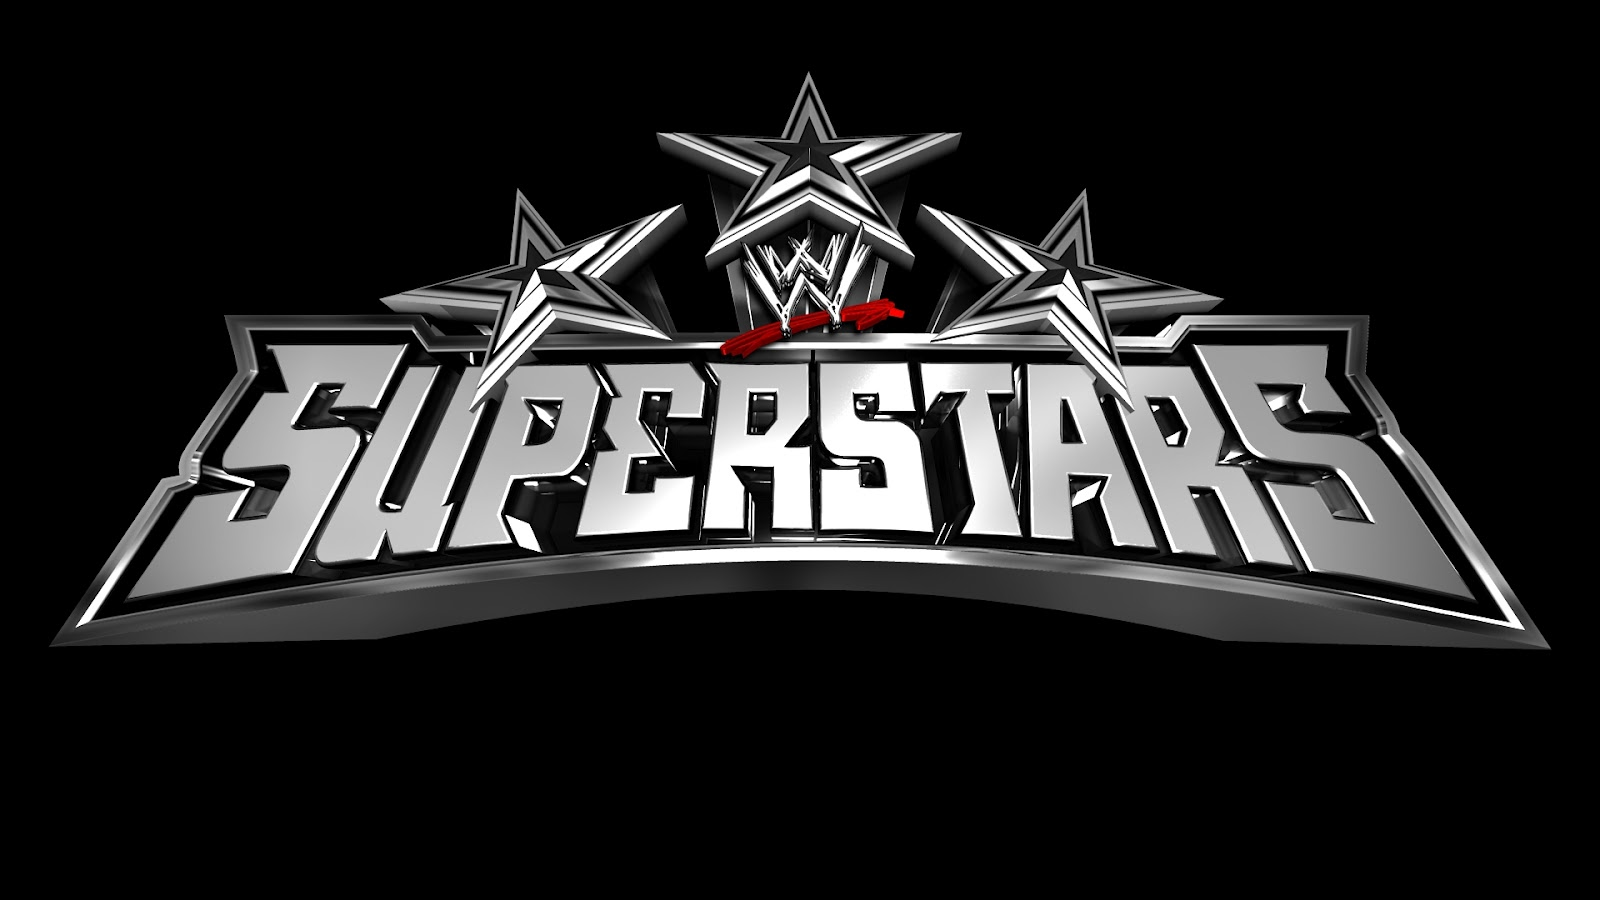 WWE WALLPAPERS wwe logo wallpaper wwe logo images wwe logo pics 1600x900